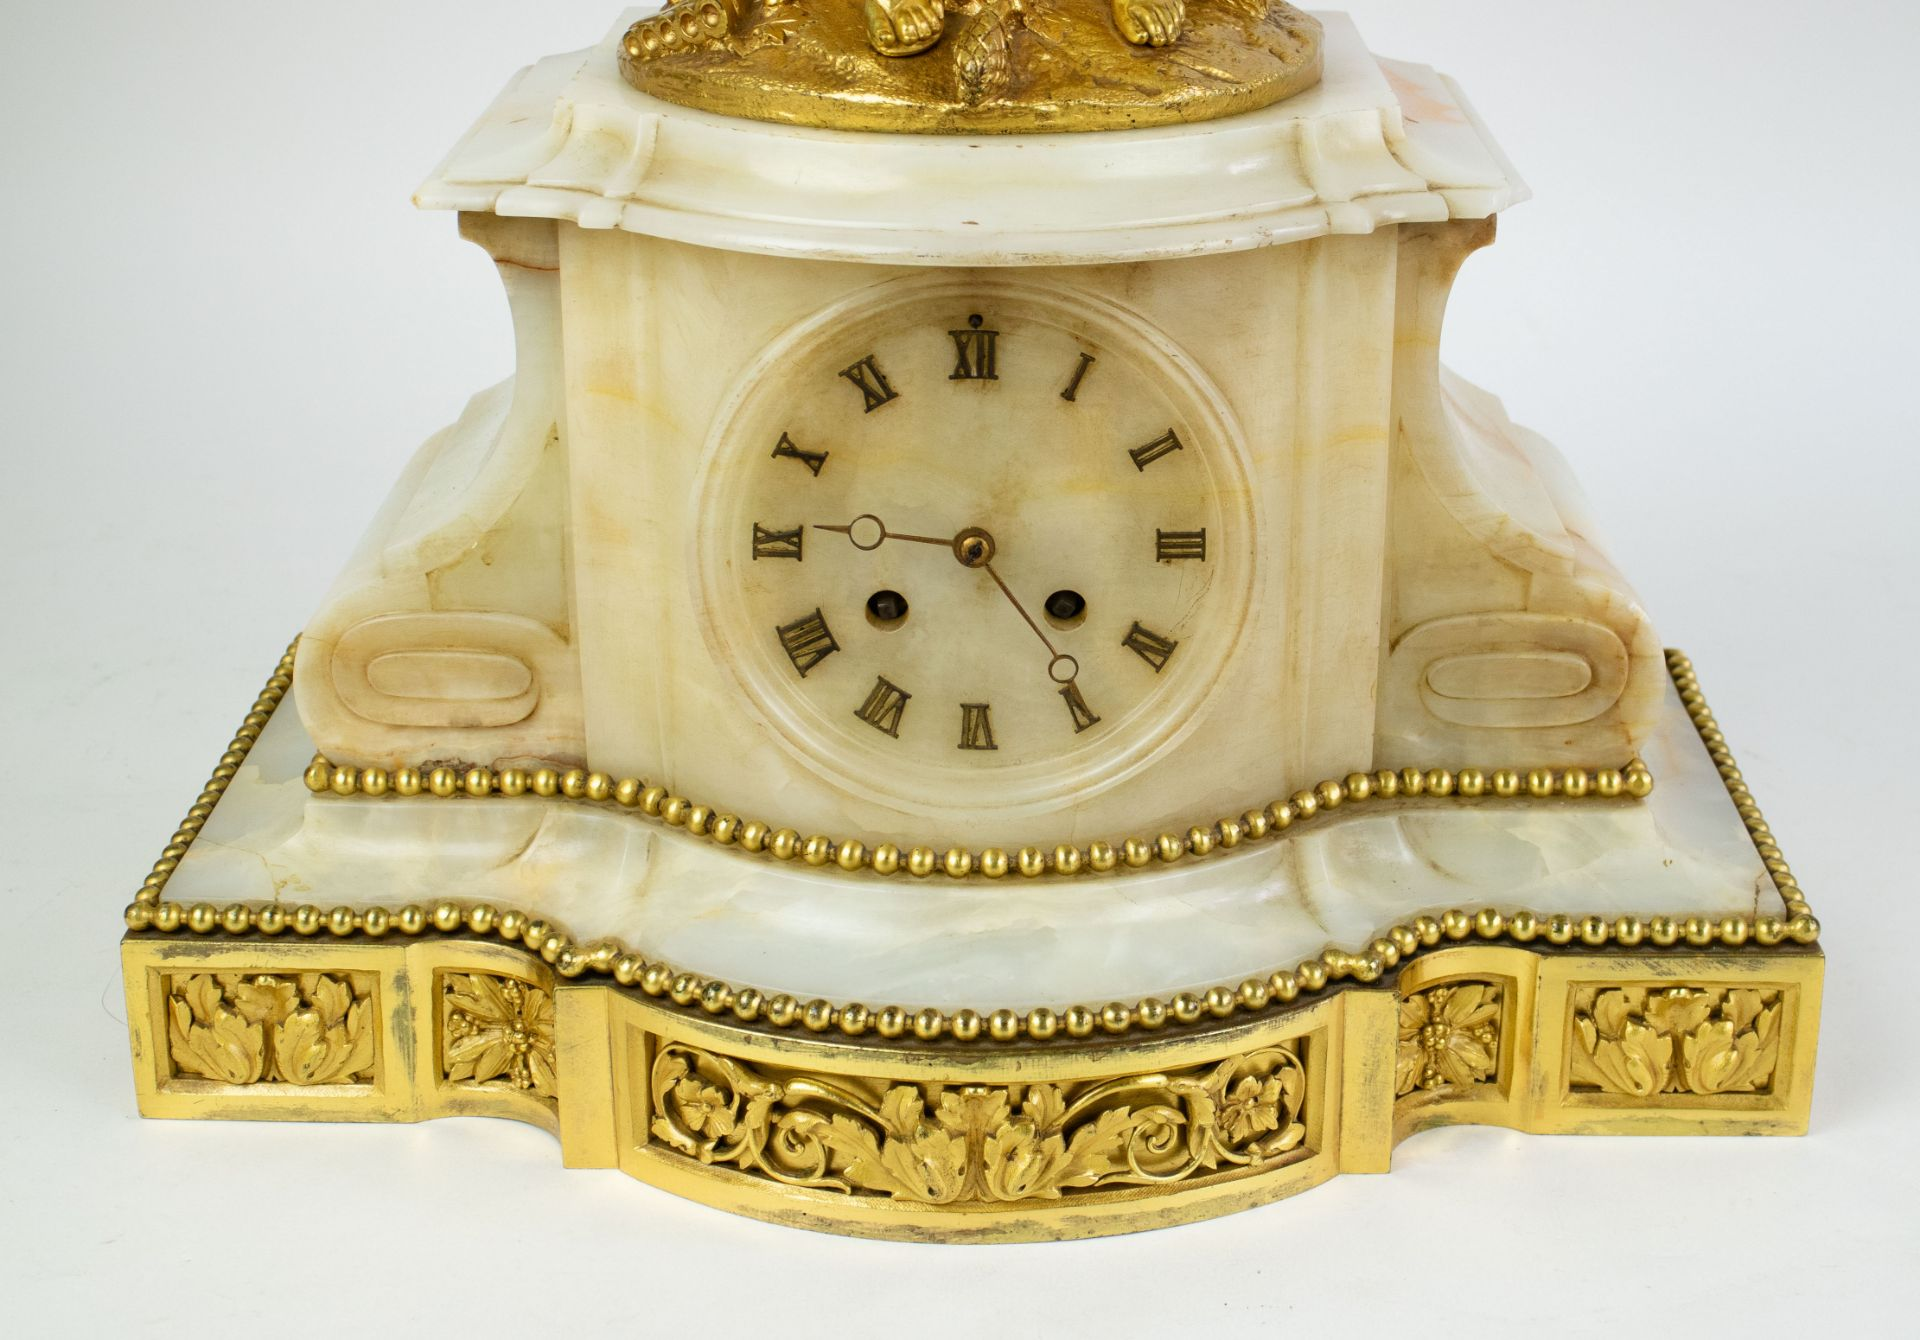 Ormulu clock with candelabra - Image 3 of 16